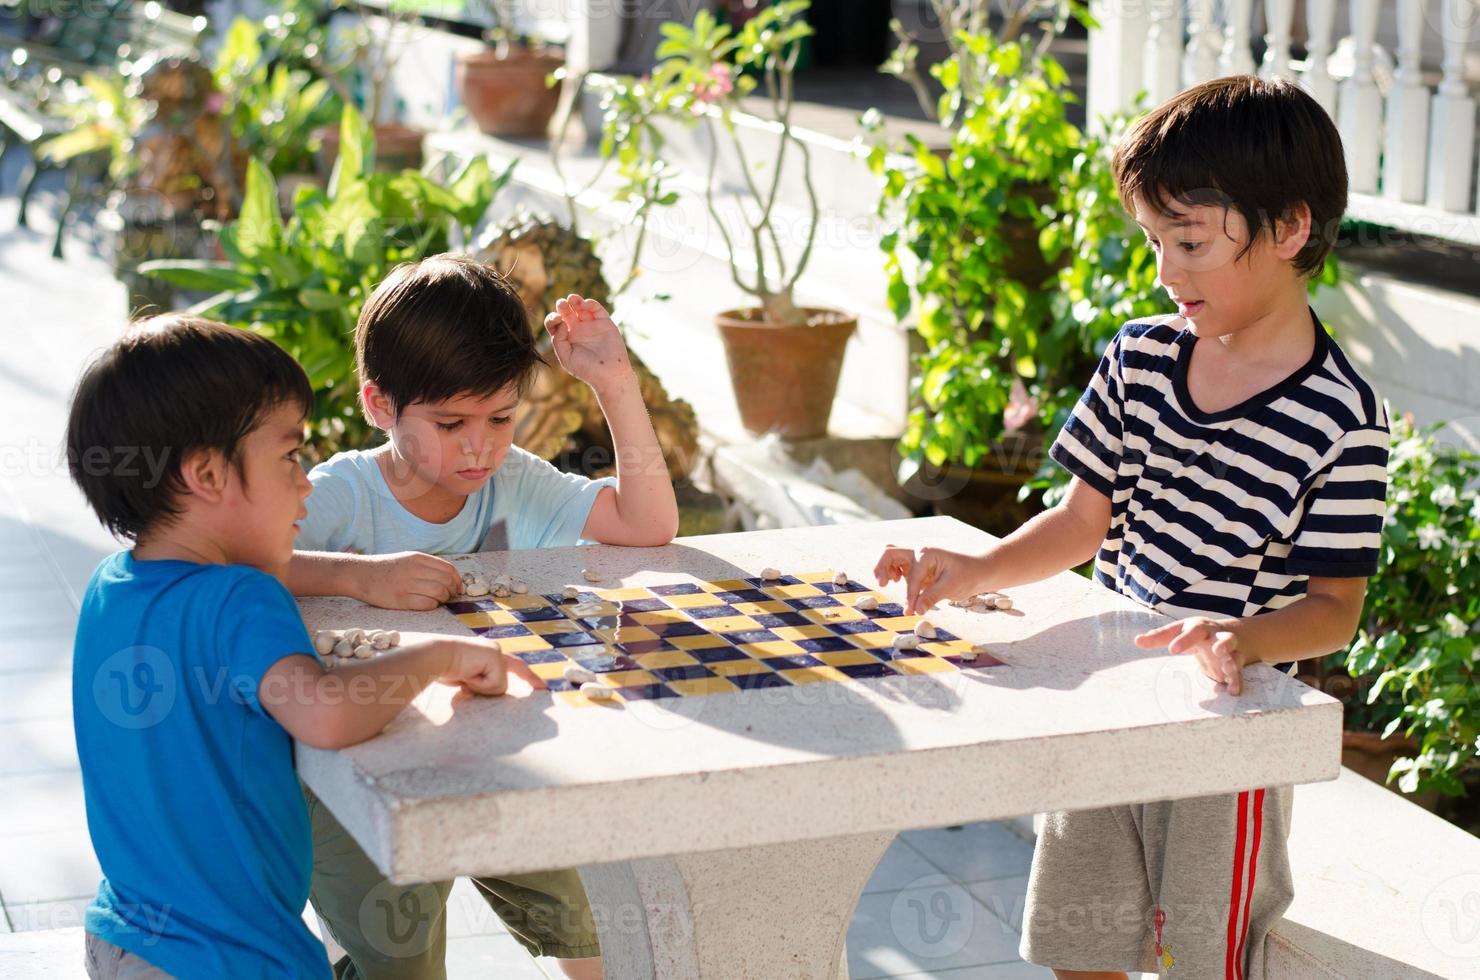 petit garçon, jouer pierre, échecs, ensemble photo